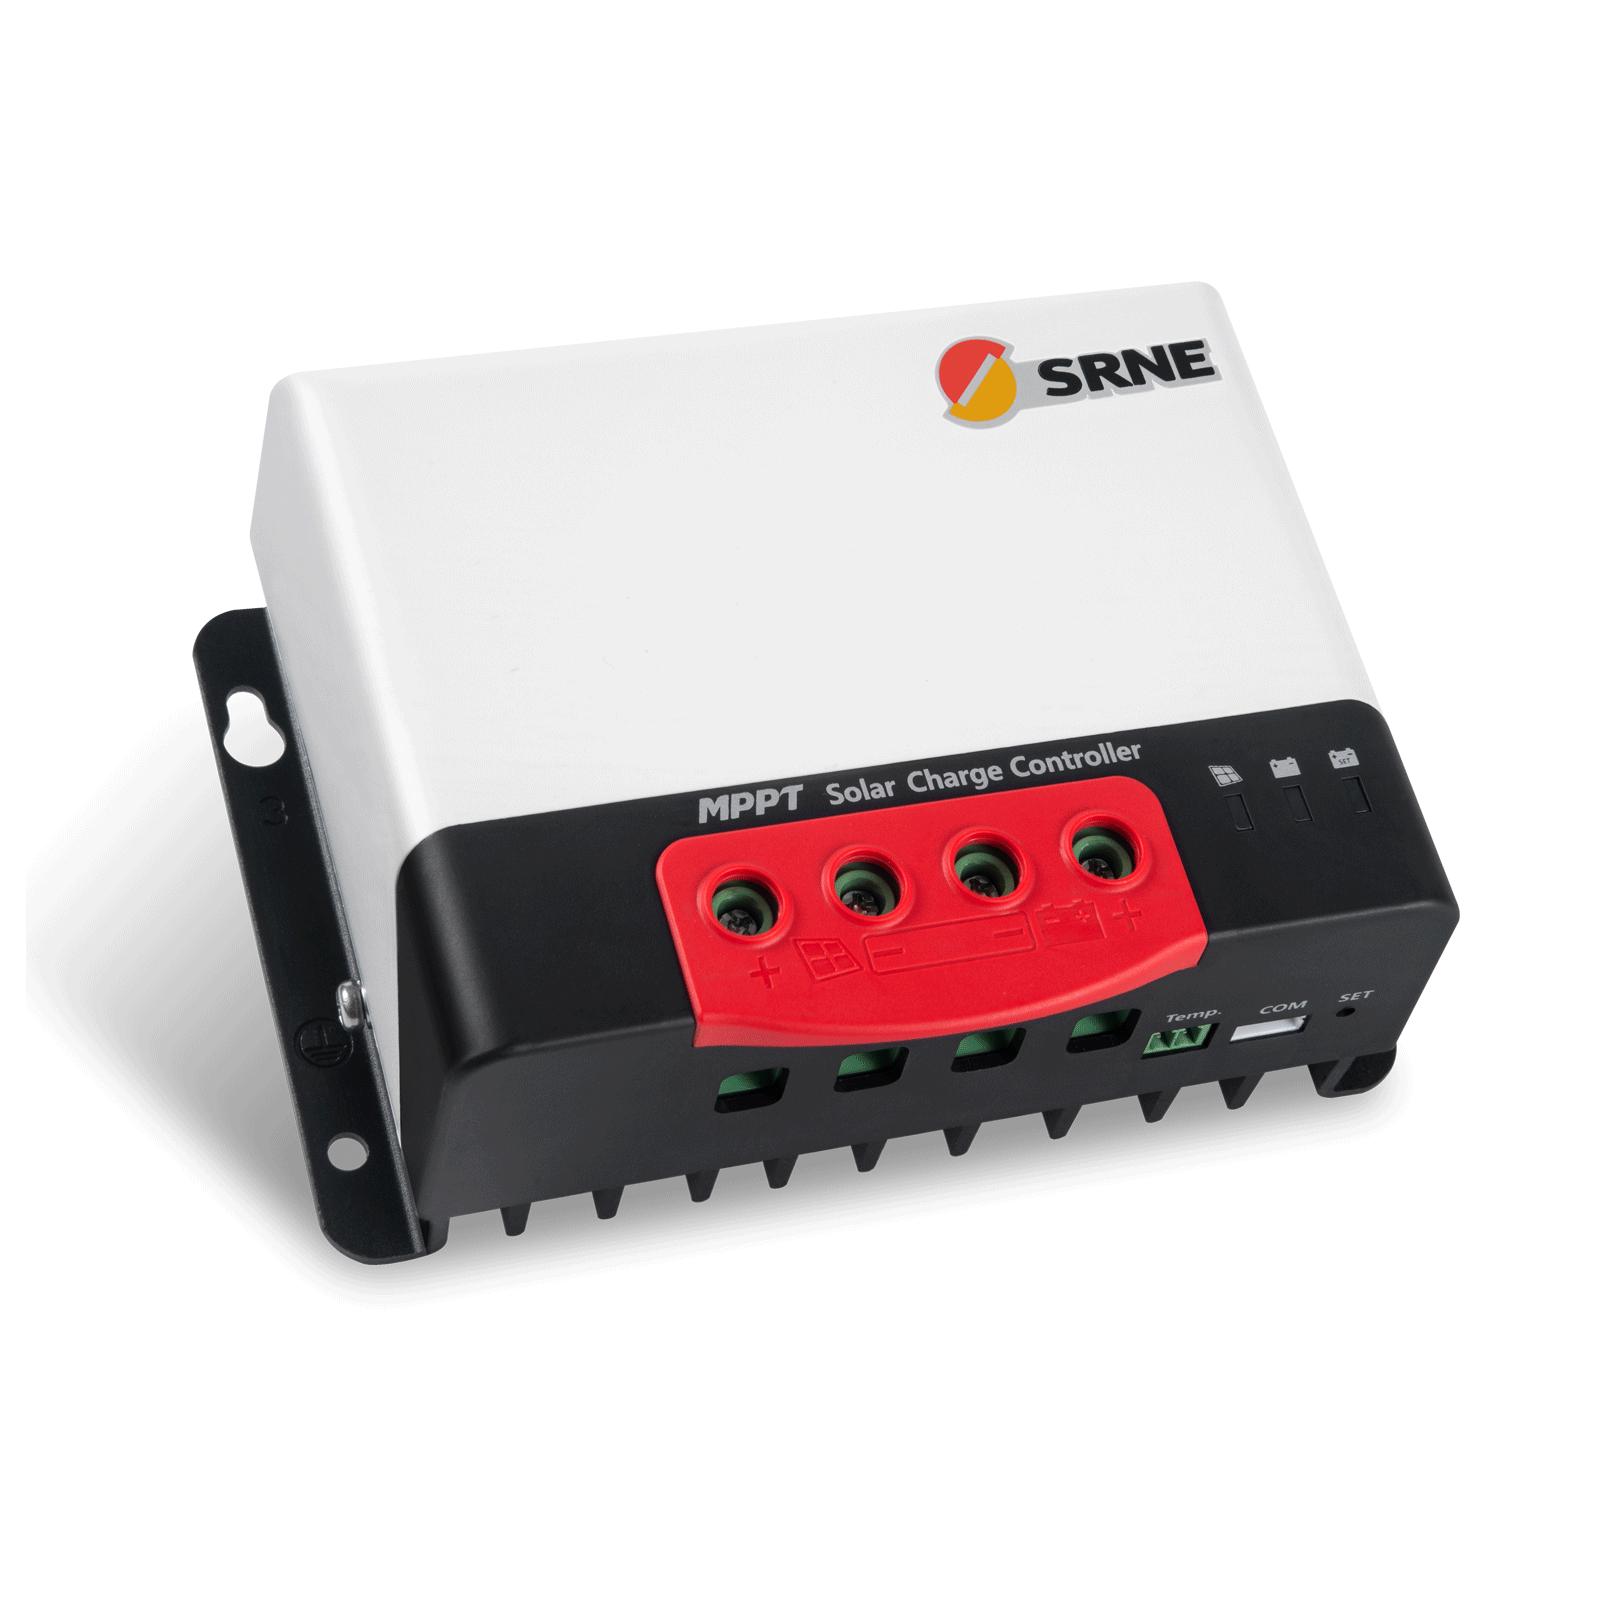 MPPT Solar Charge Controller MC2420